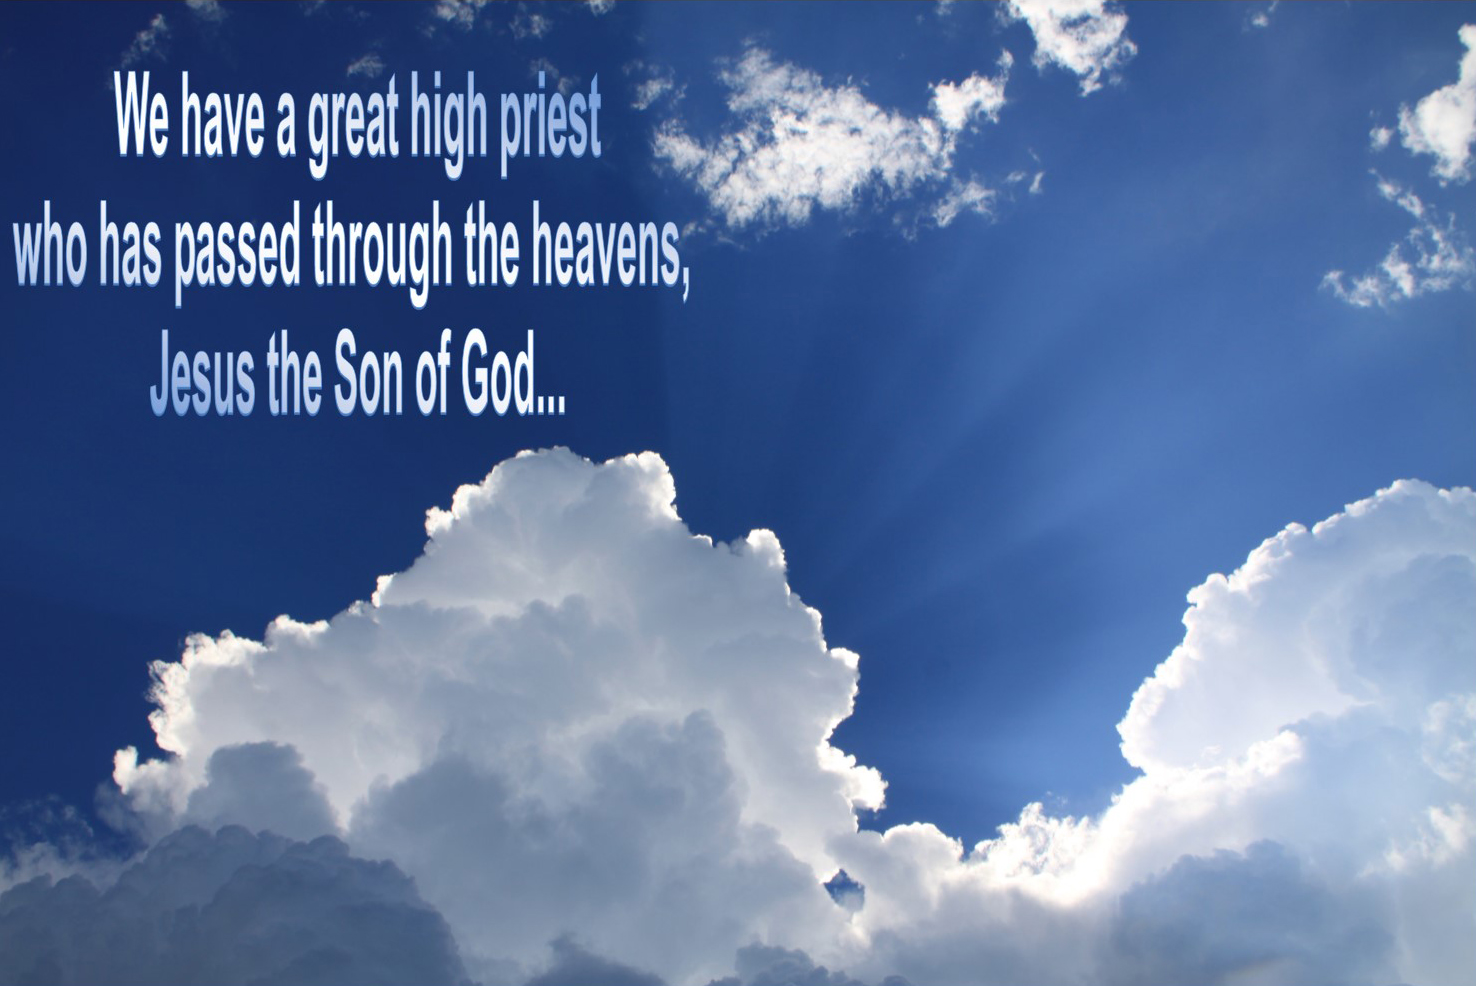 Great high priest.jpg